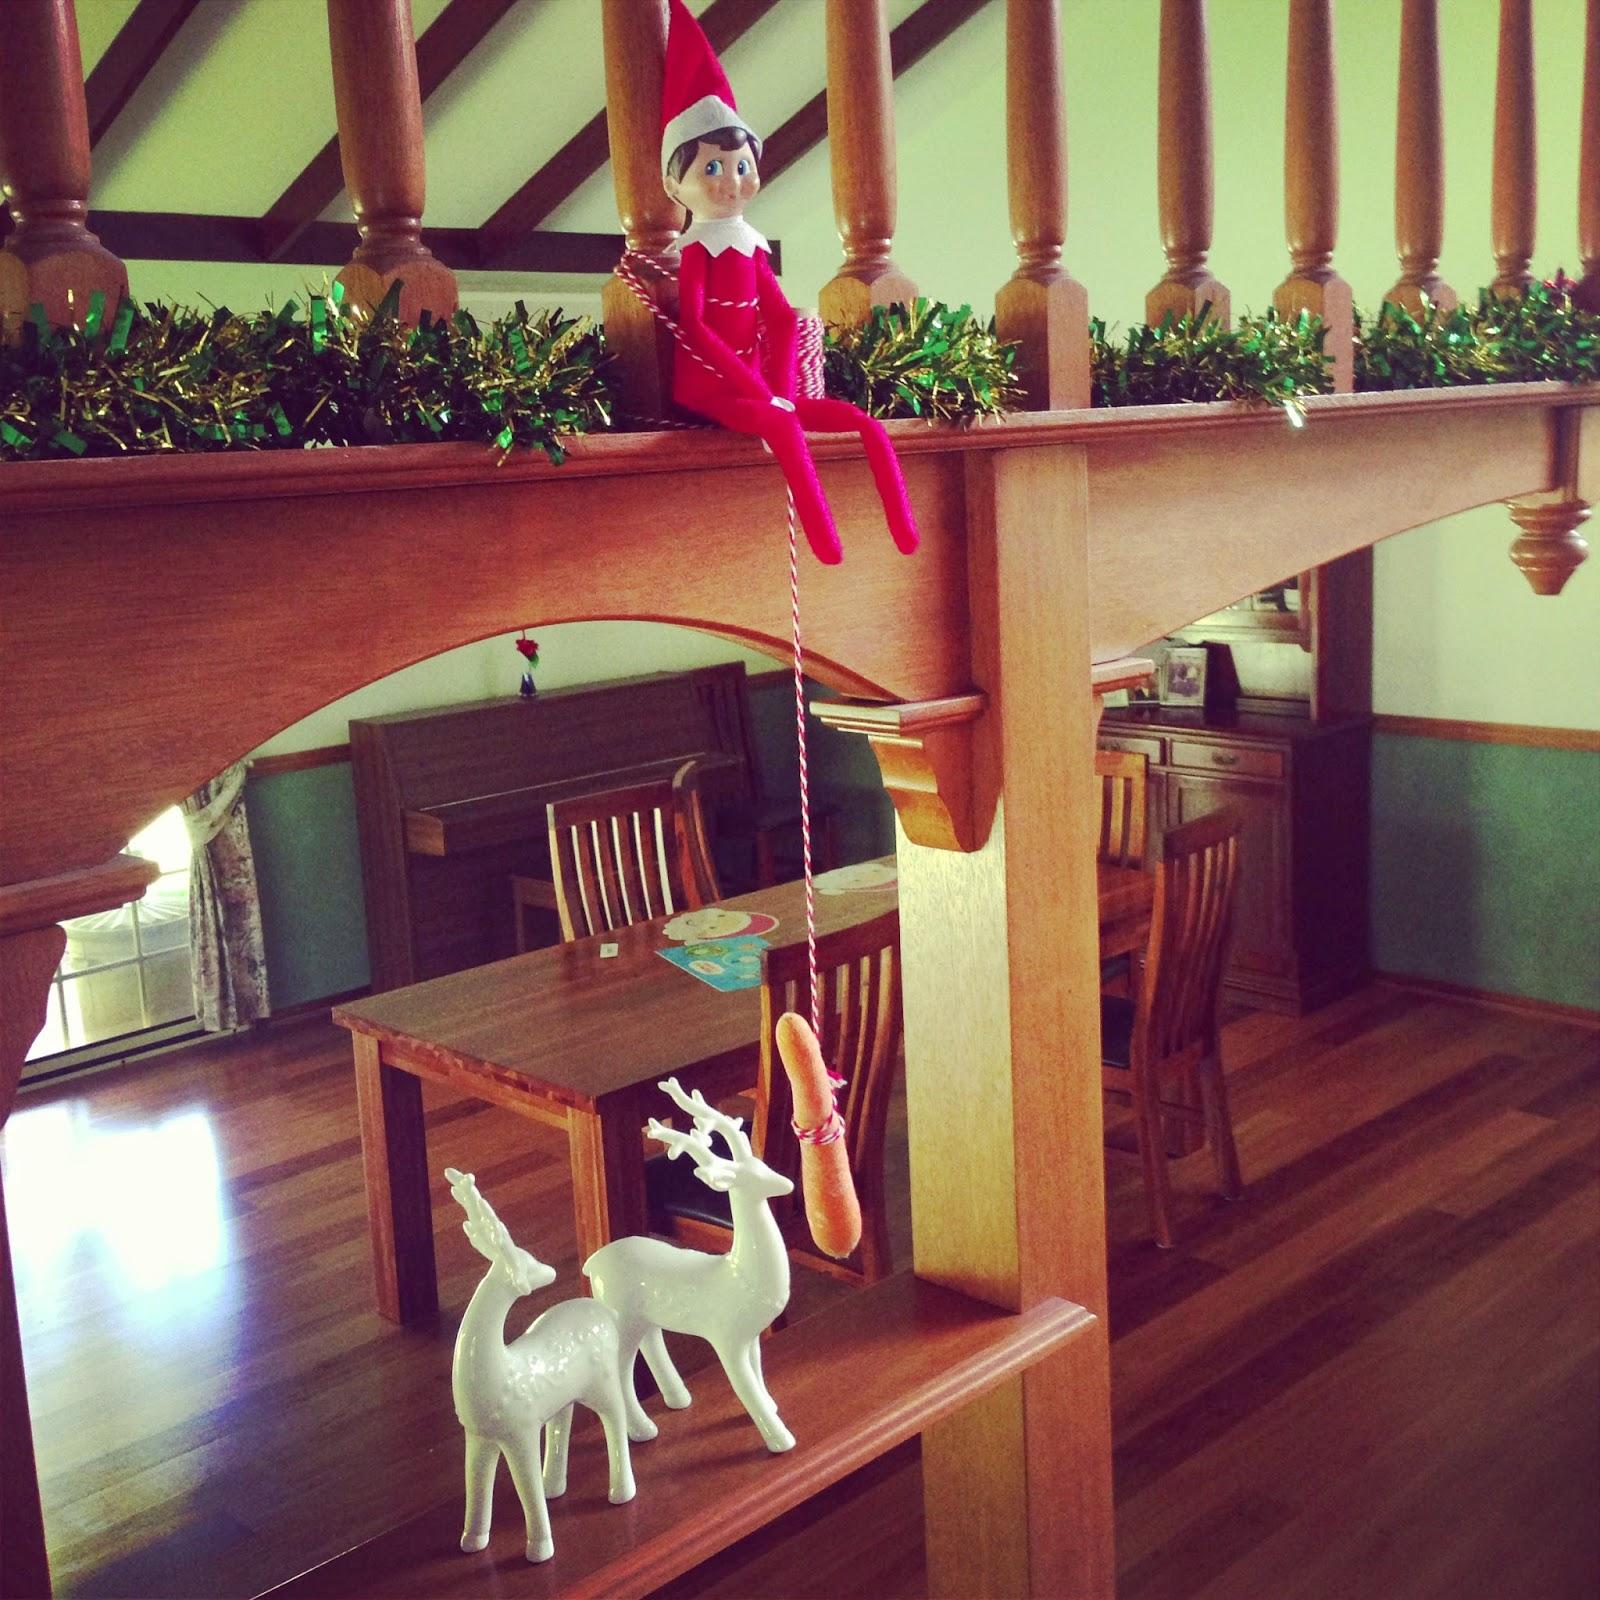 Elf on the shelf feeding a reindeer.